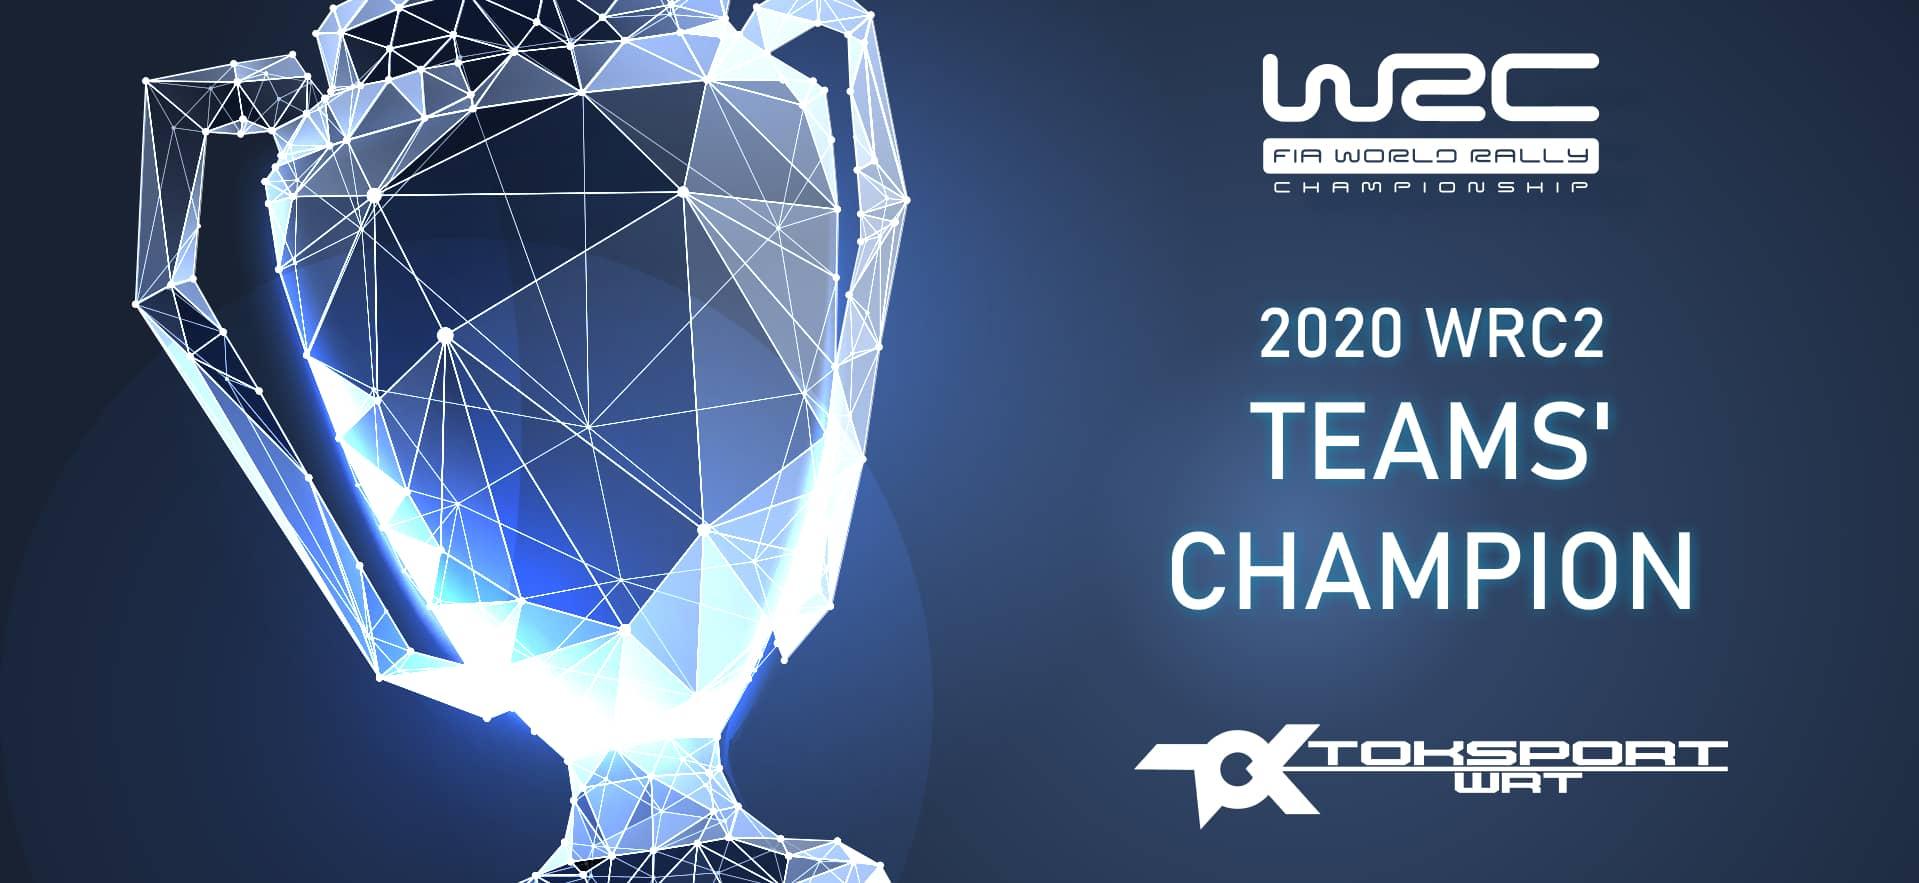 2020 WRC2 Teams Champion